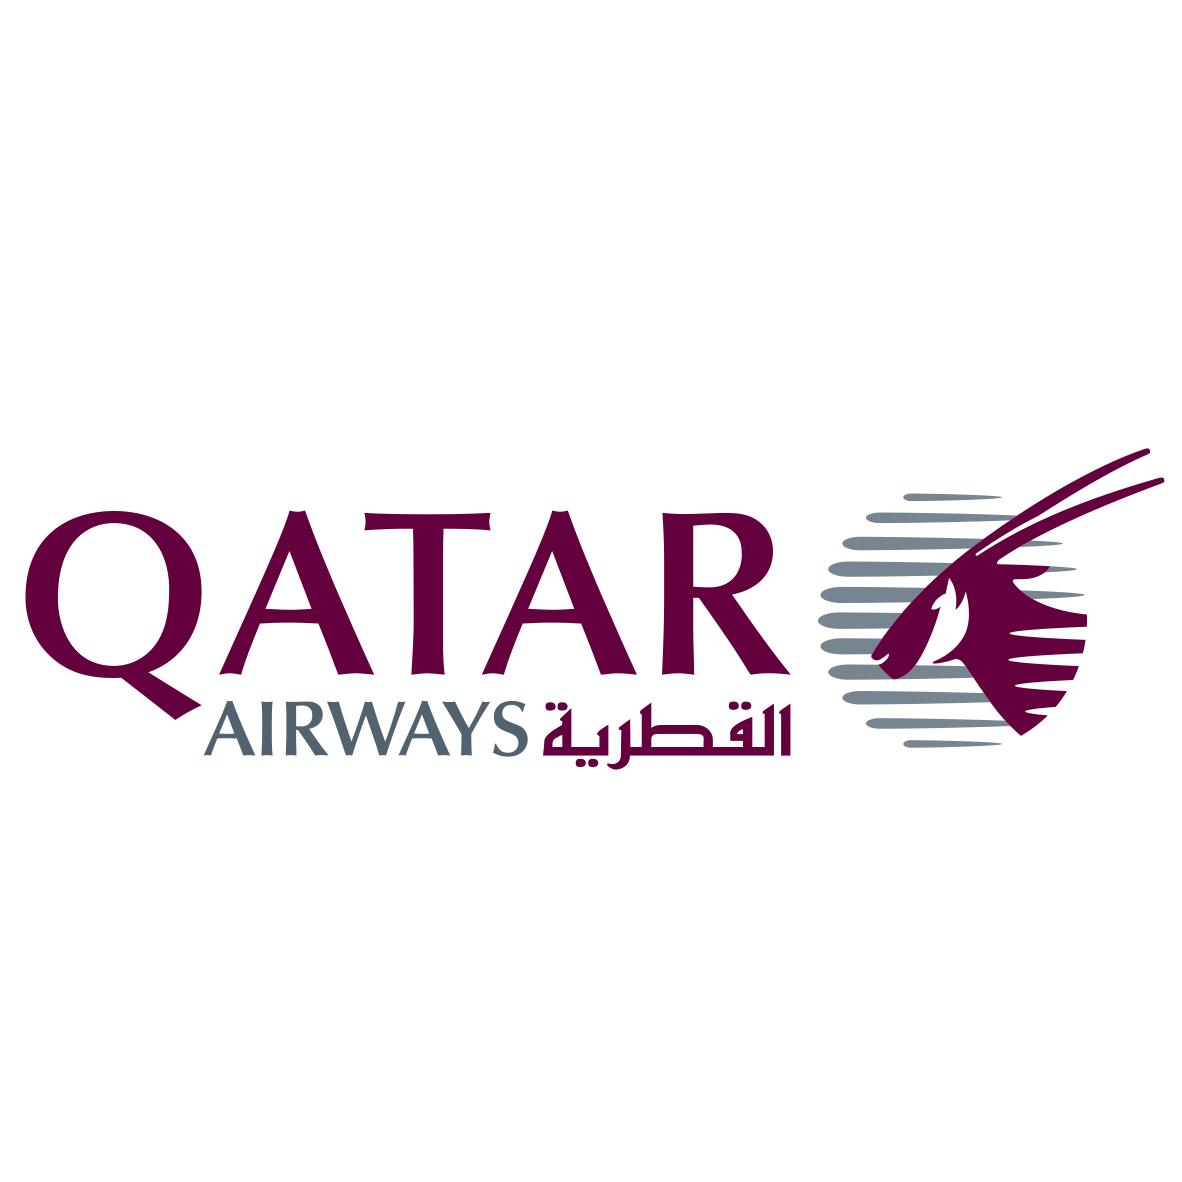 Qatar_logo.jpg